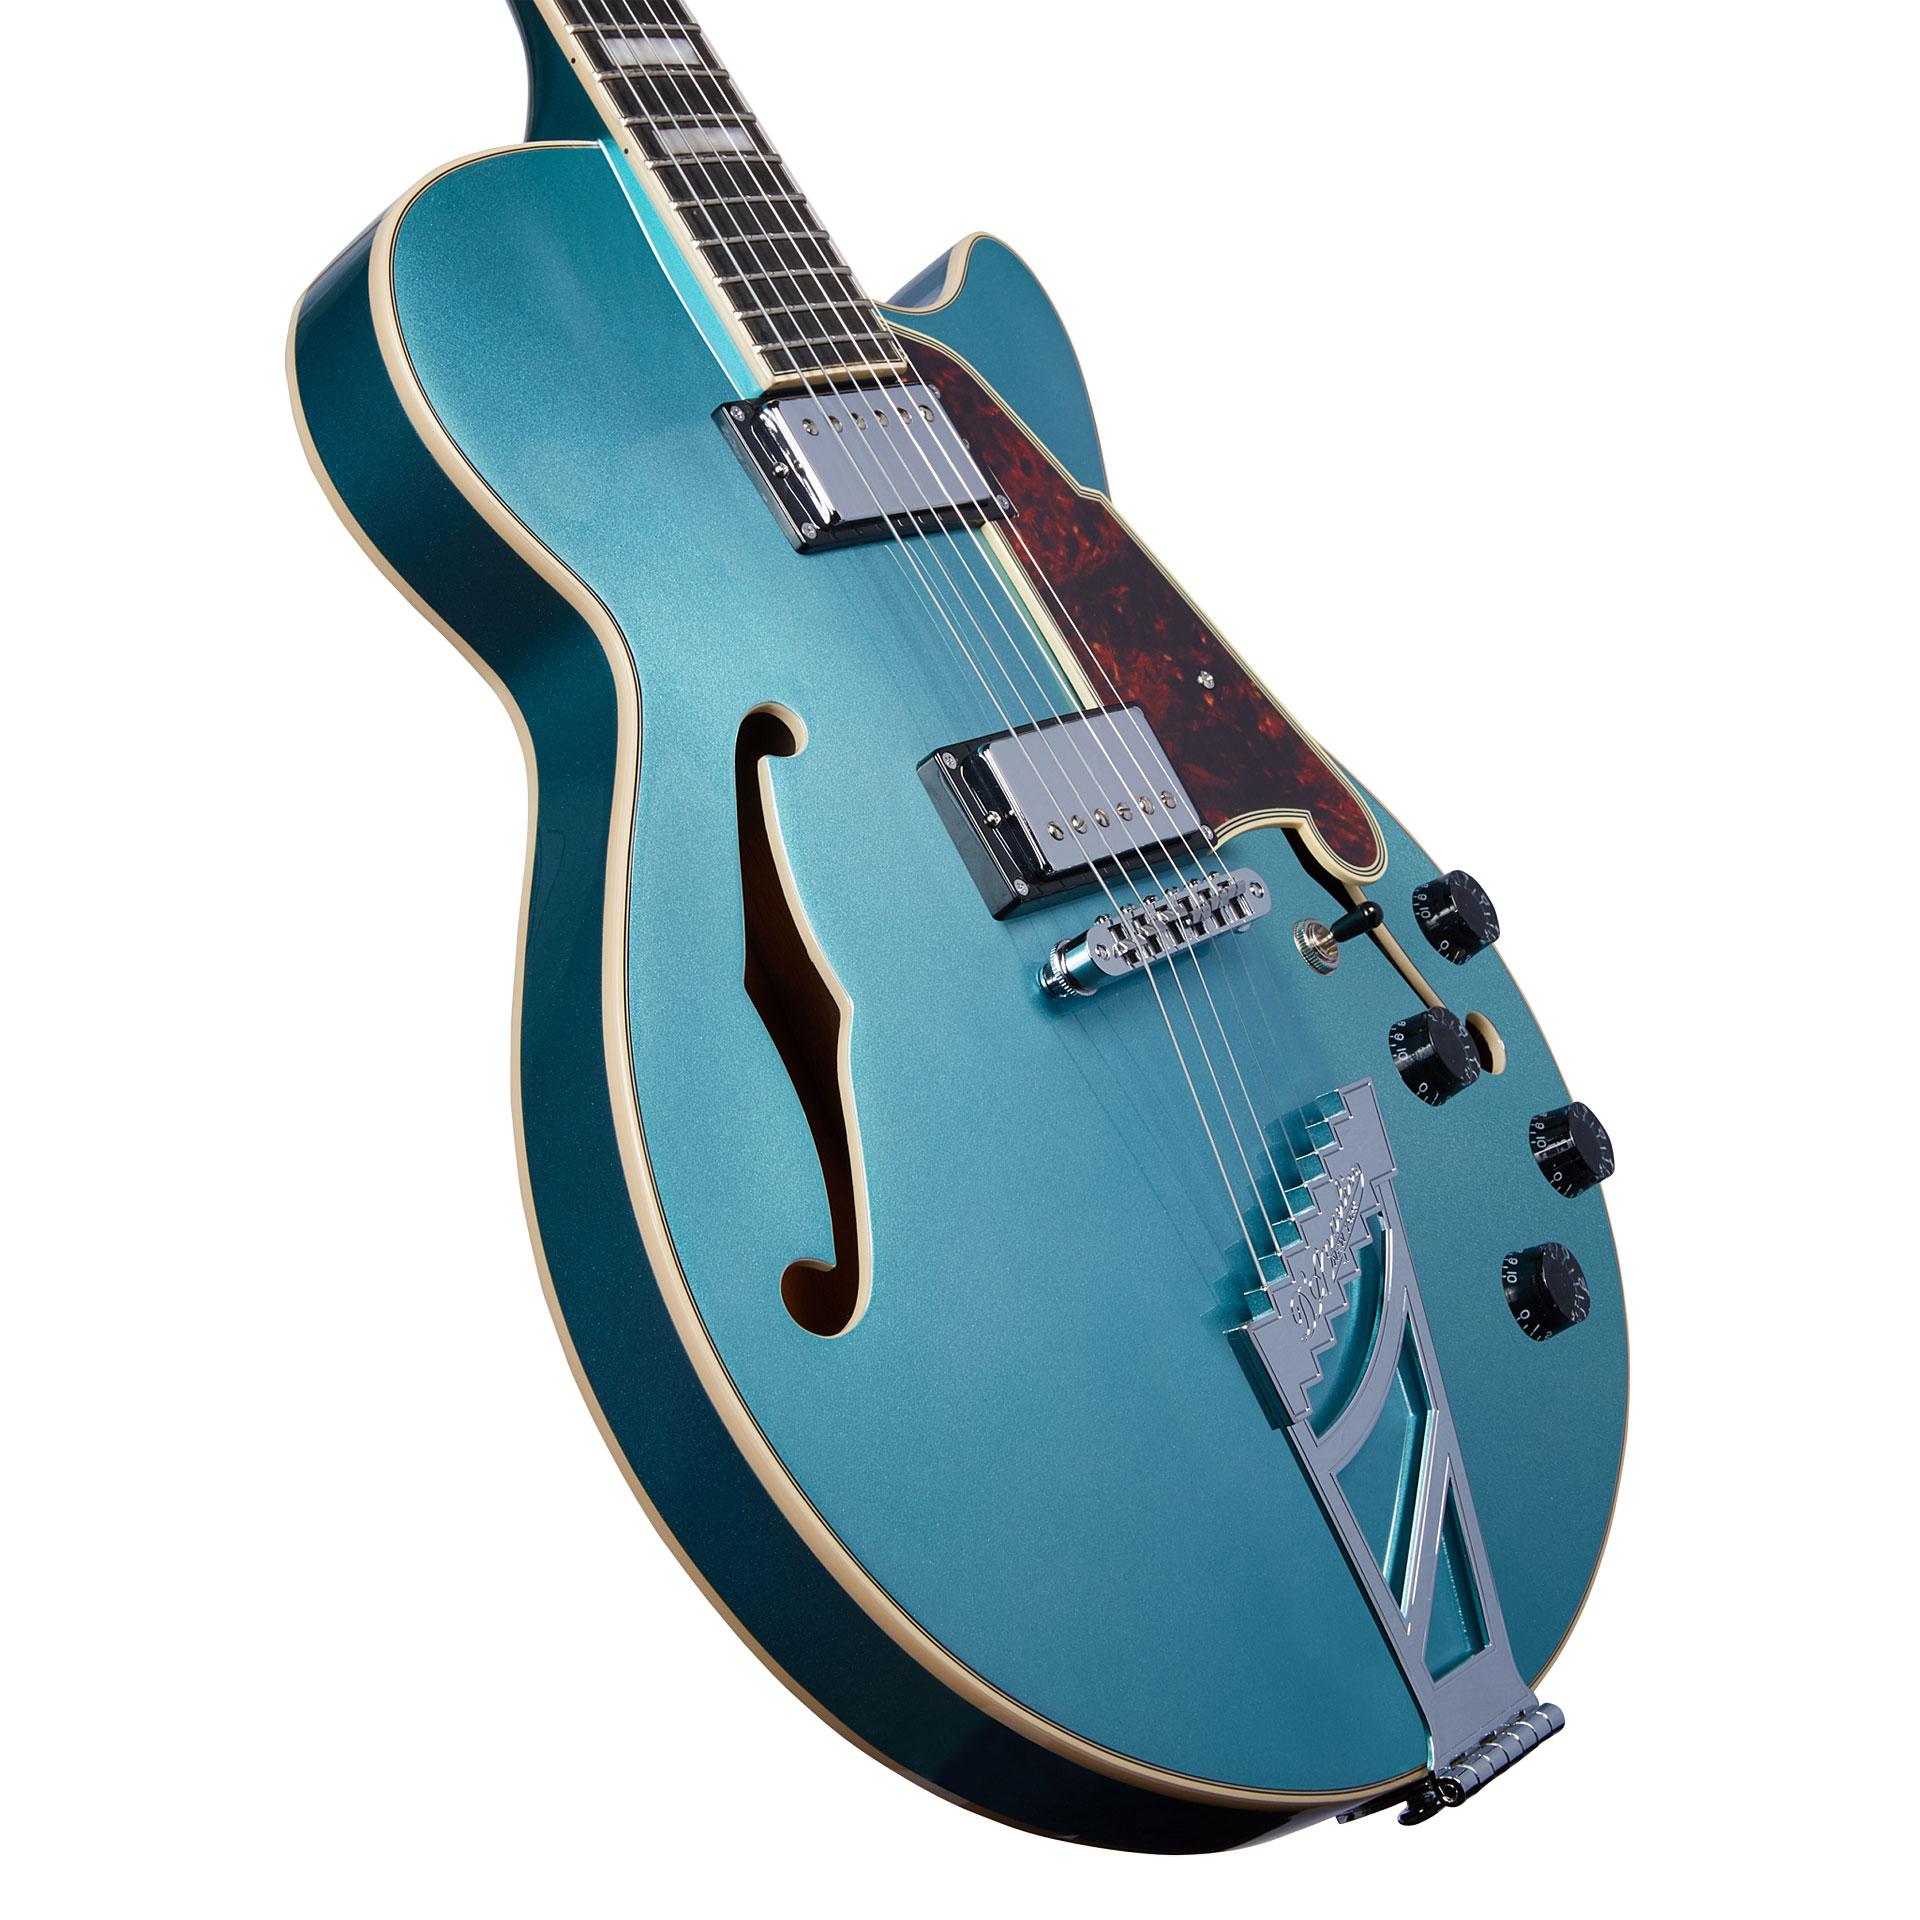 D/'Angelico 024 Plain Einzelsaite E-Gitarre Westerngitarre